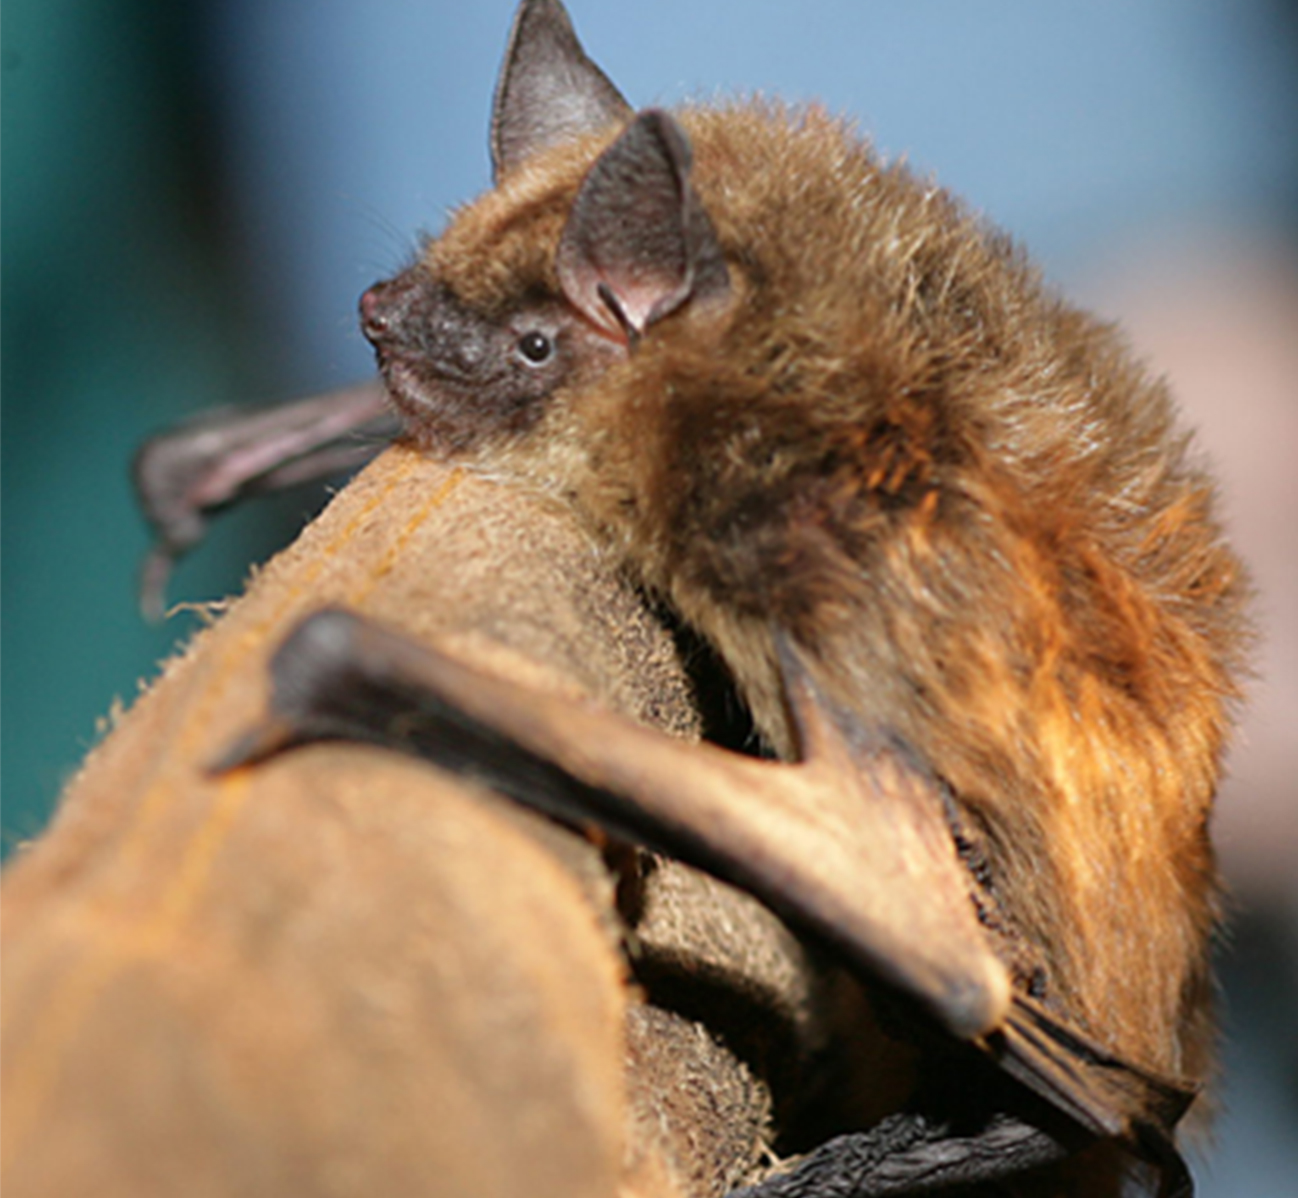 Bat On Leather Glove